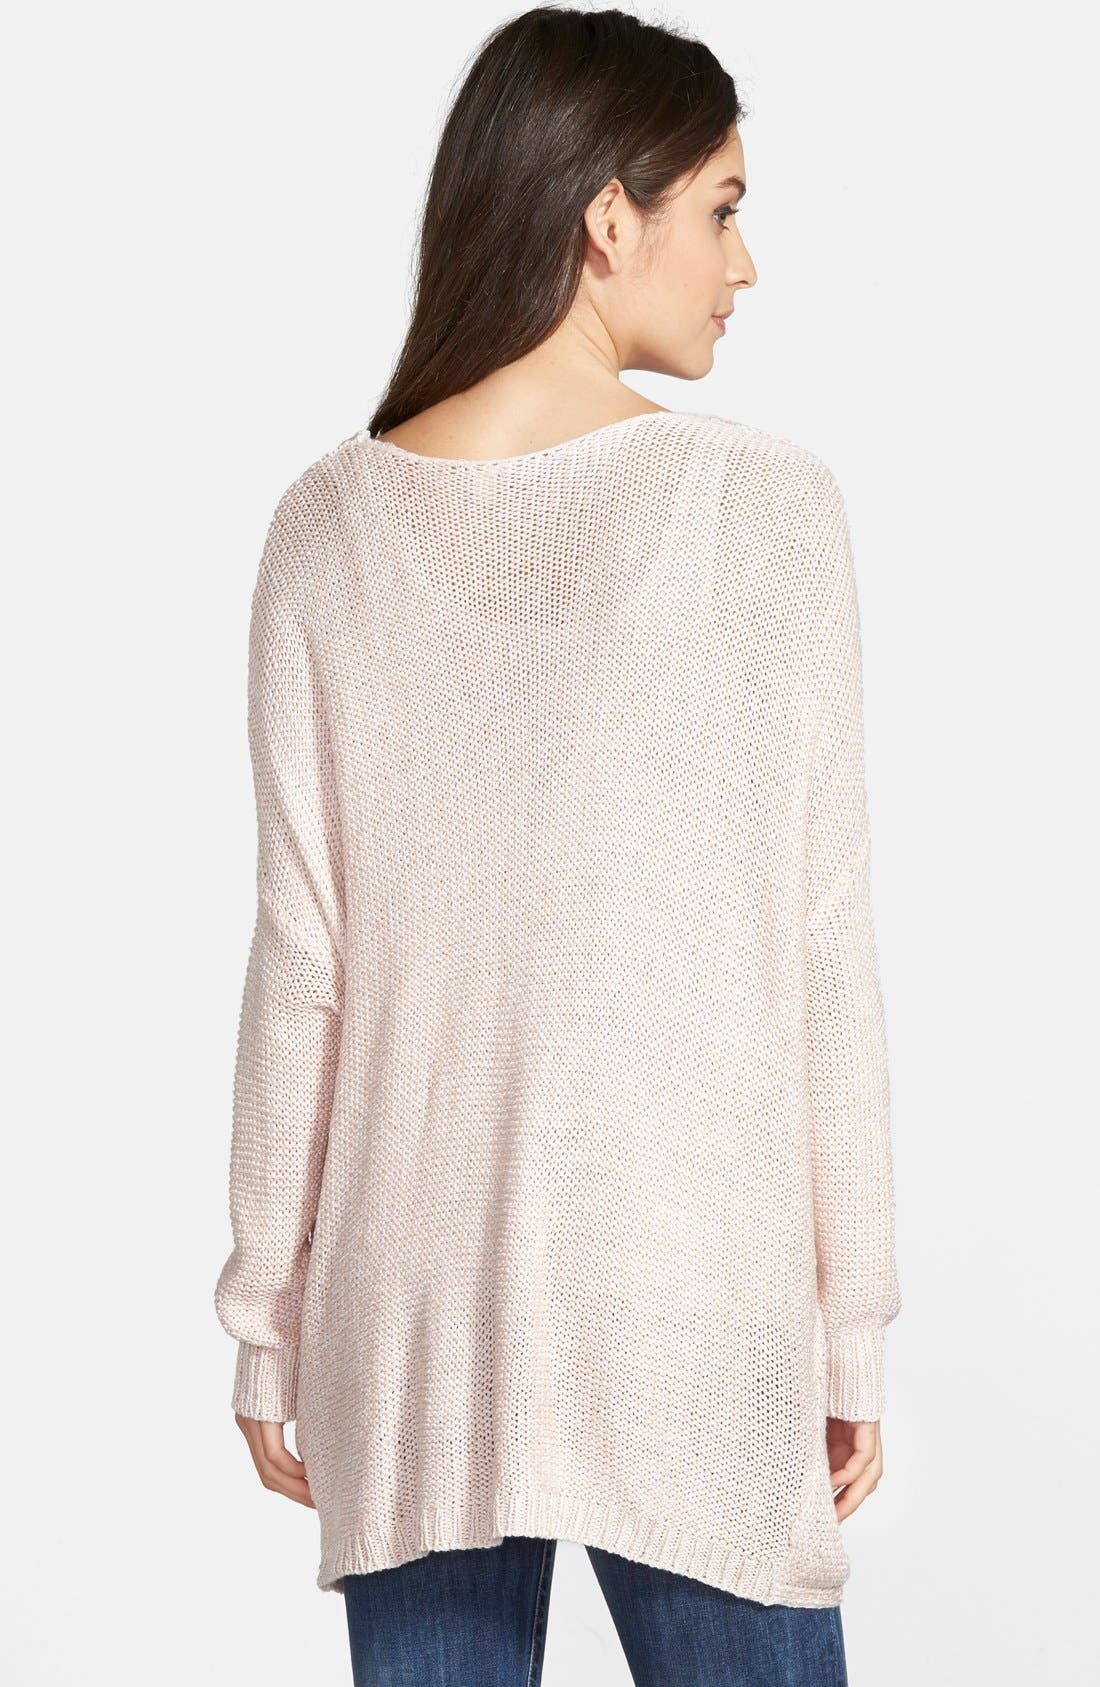 Wrap Front Sweater,                             Alternate thumbnail 2, color,                             Pure Blush Twist